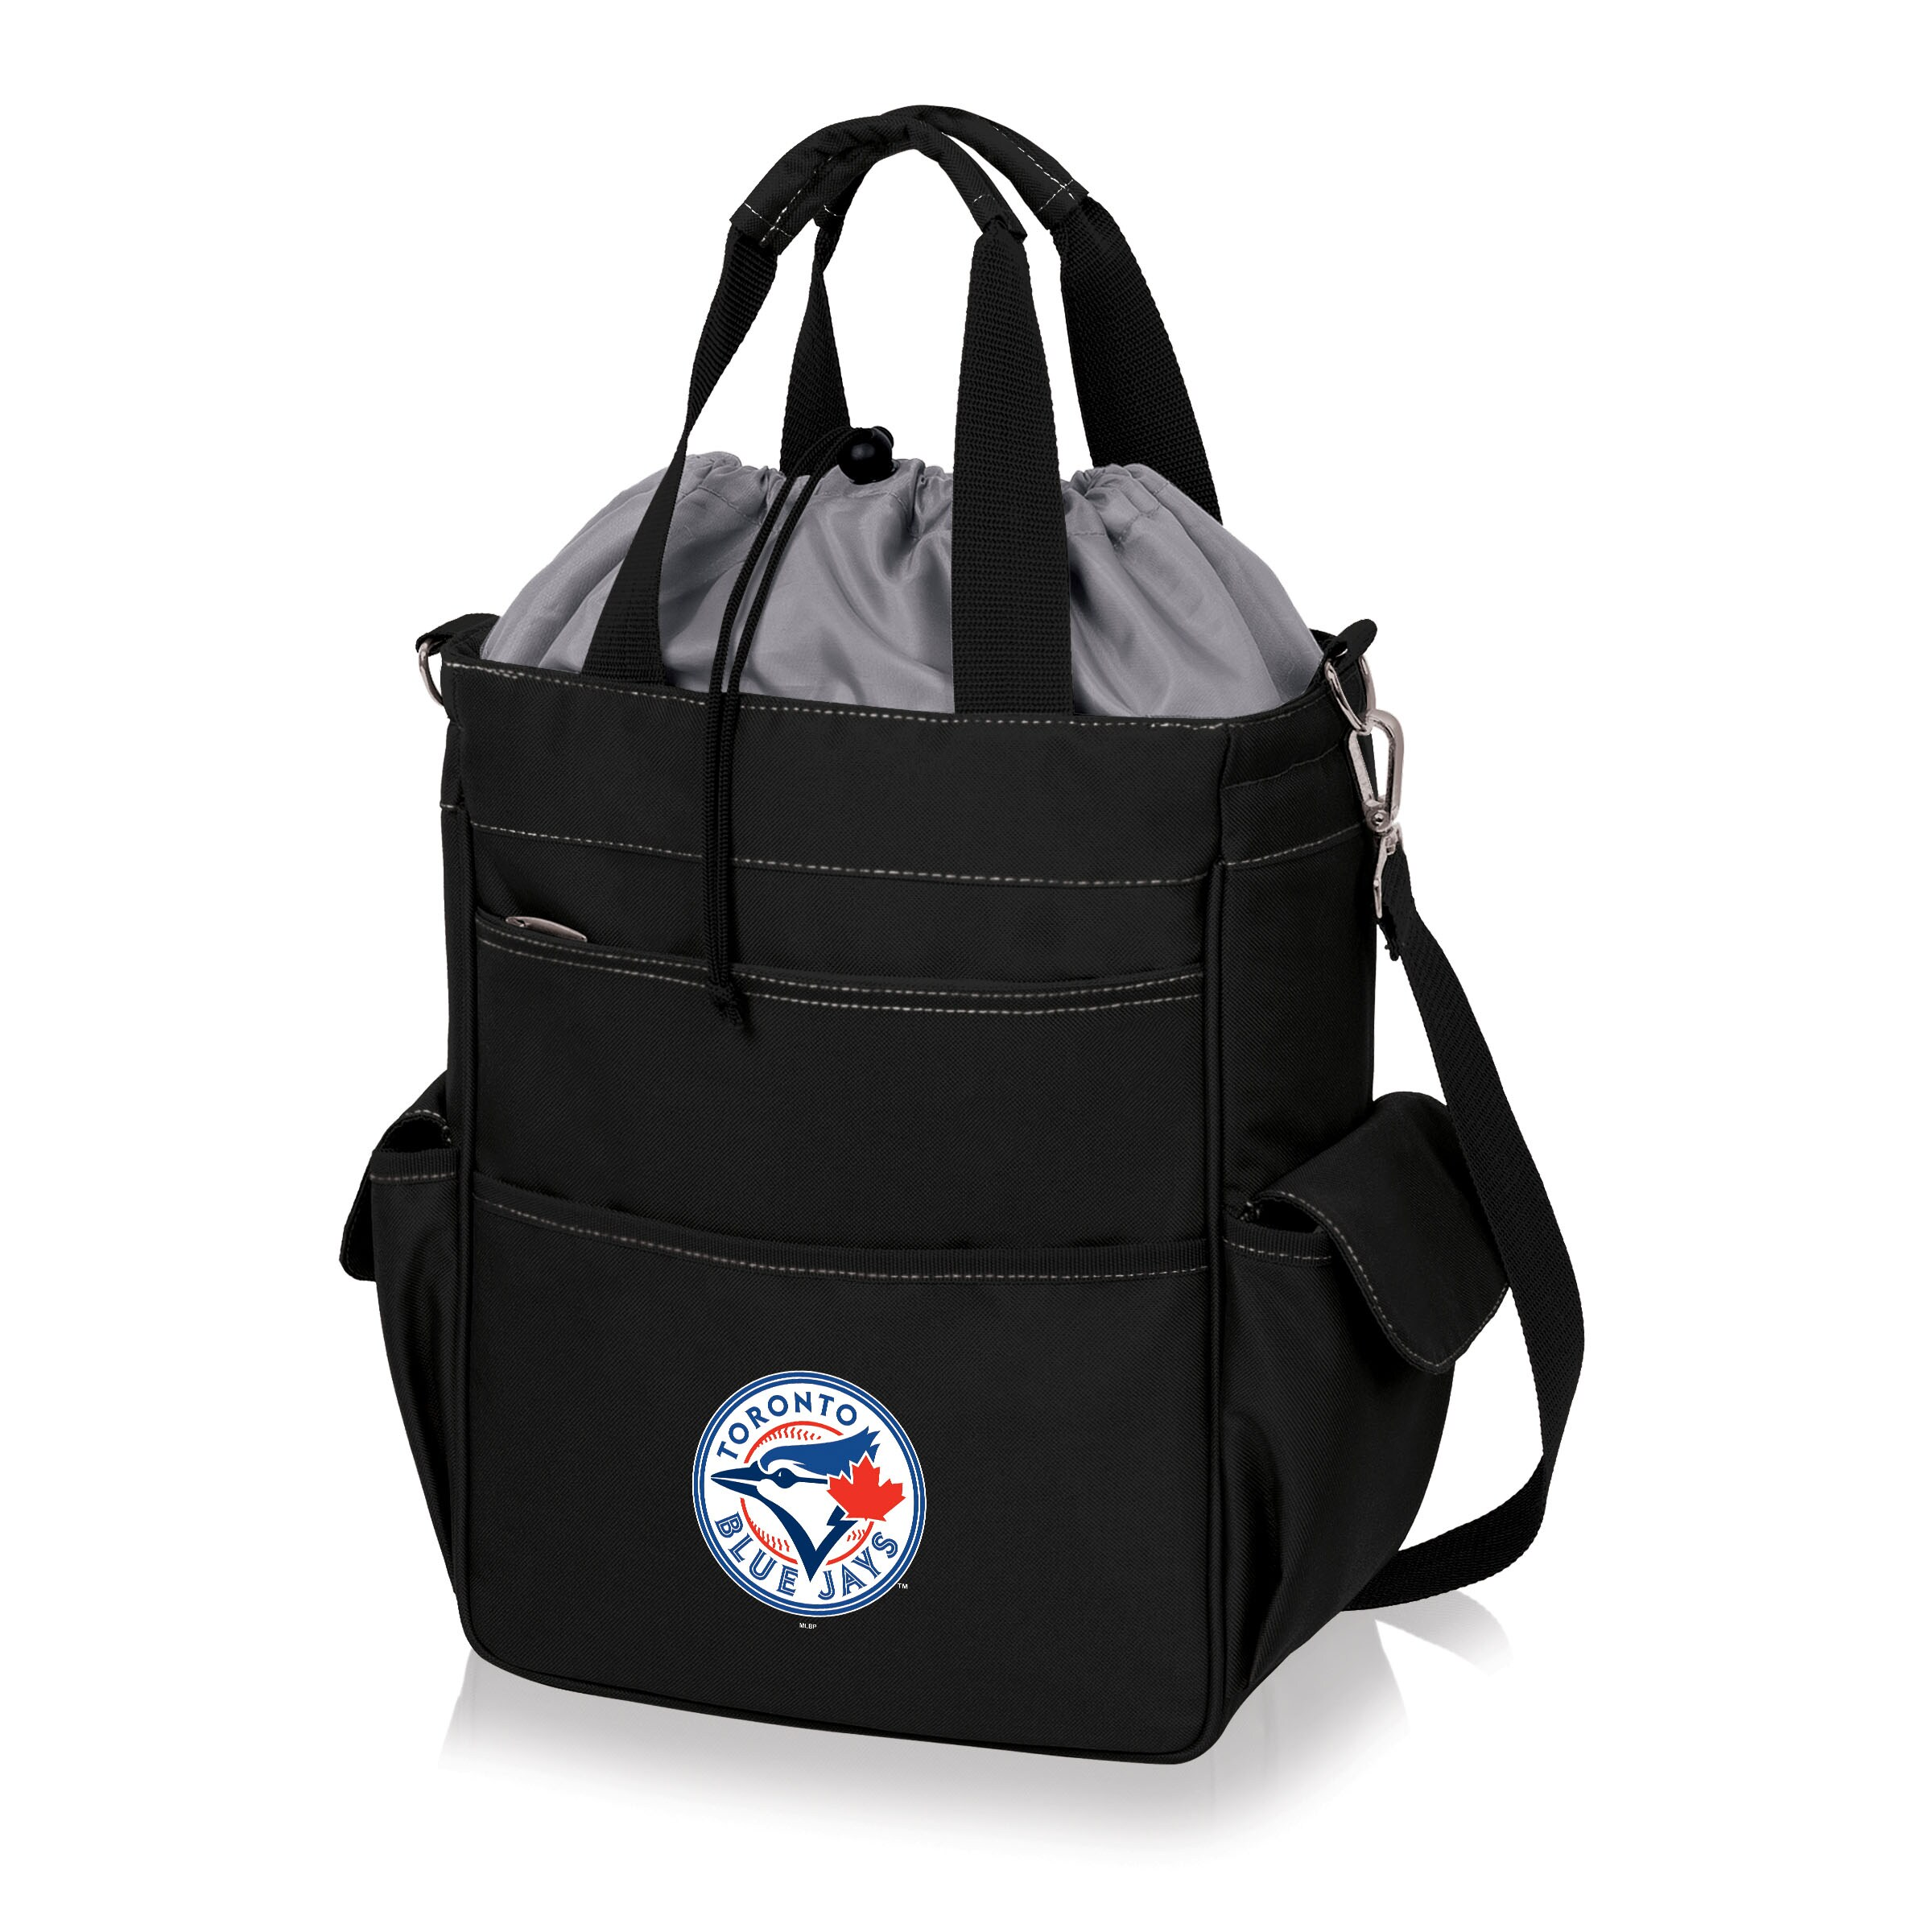 Toronto Blue Jays Activo Cooler Tote - Black